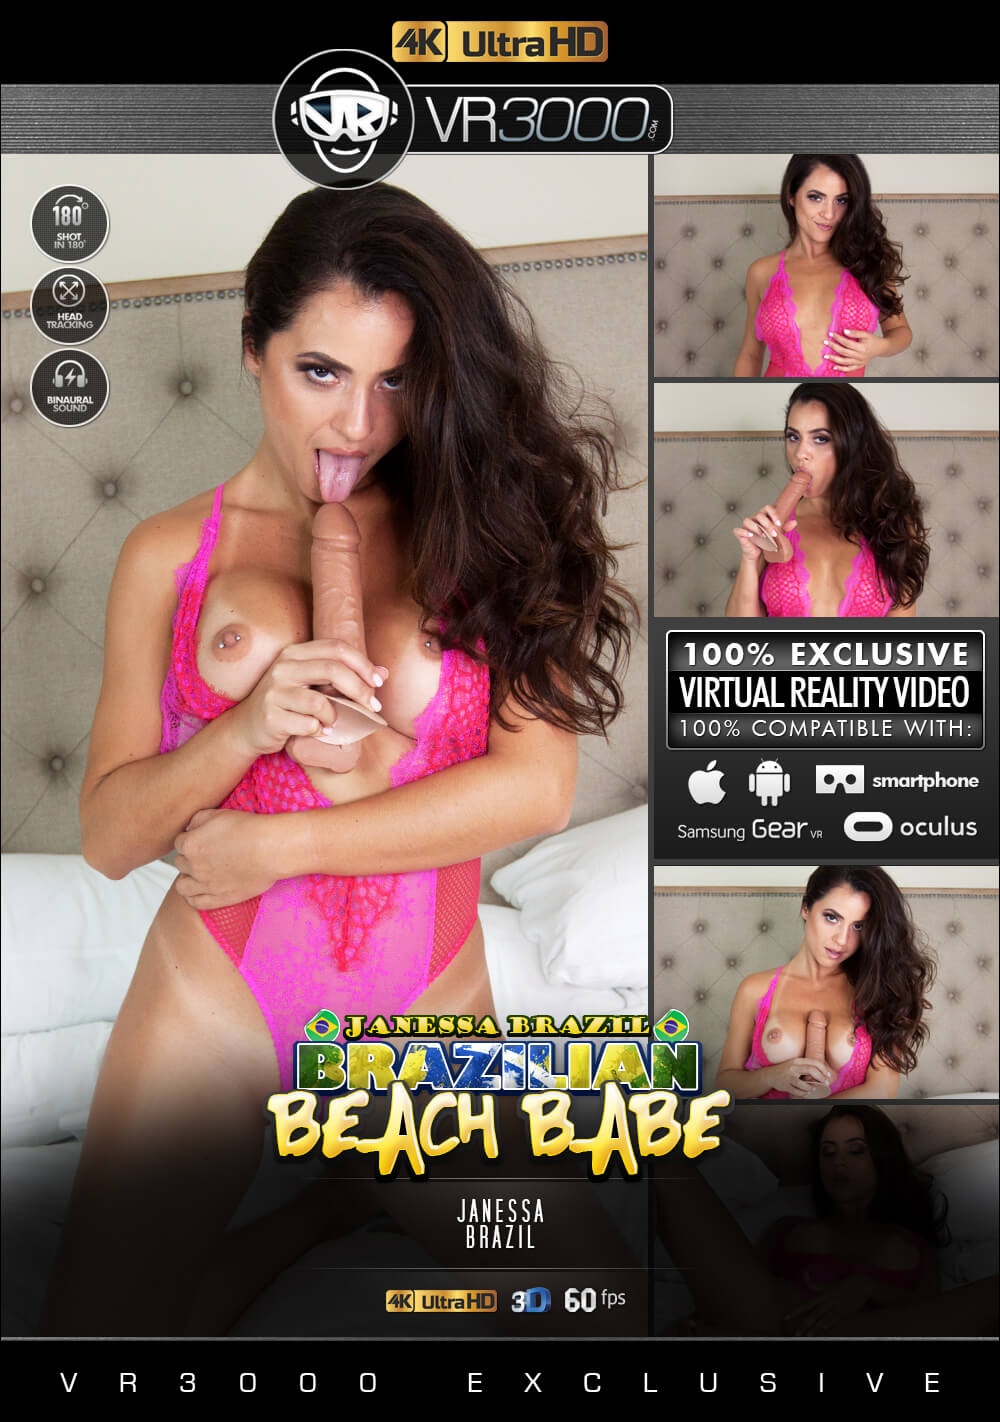 Brazilian Beach Babe